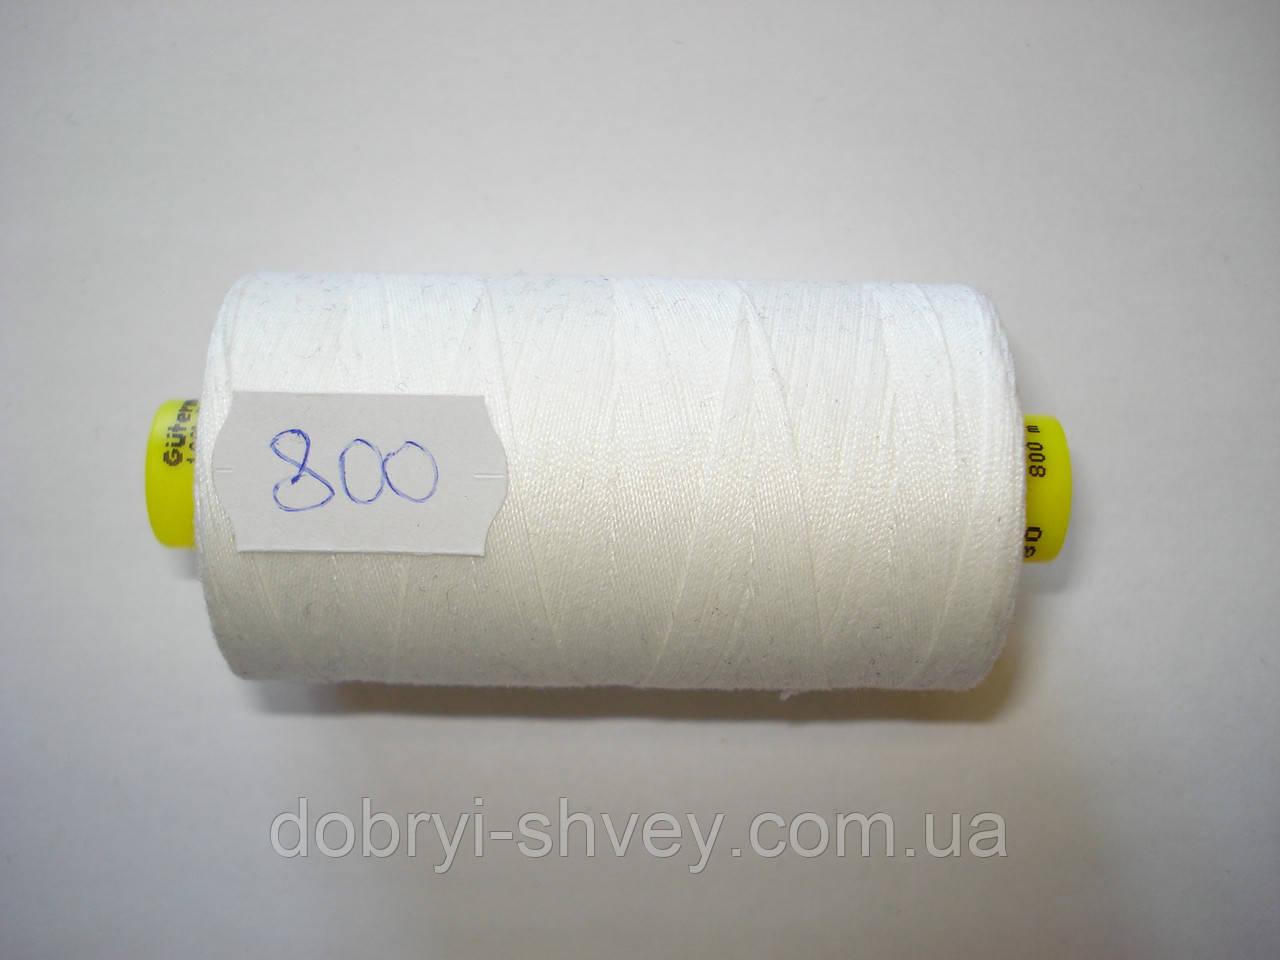 Нитка Gutermann mara №80 800м.col 800 белый (шт.)